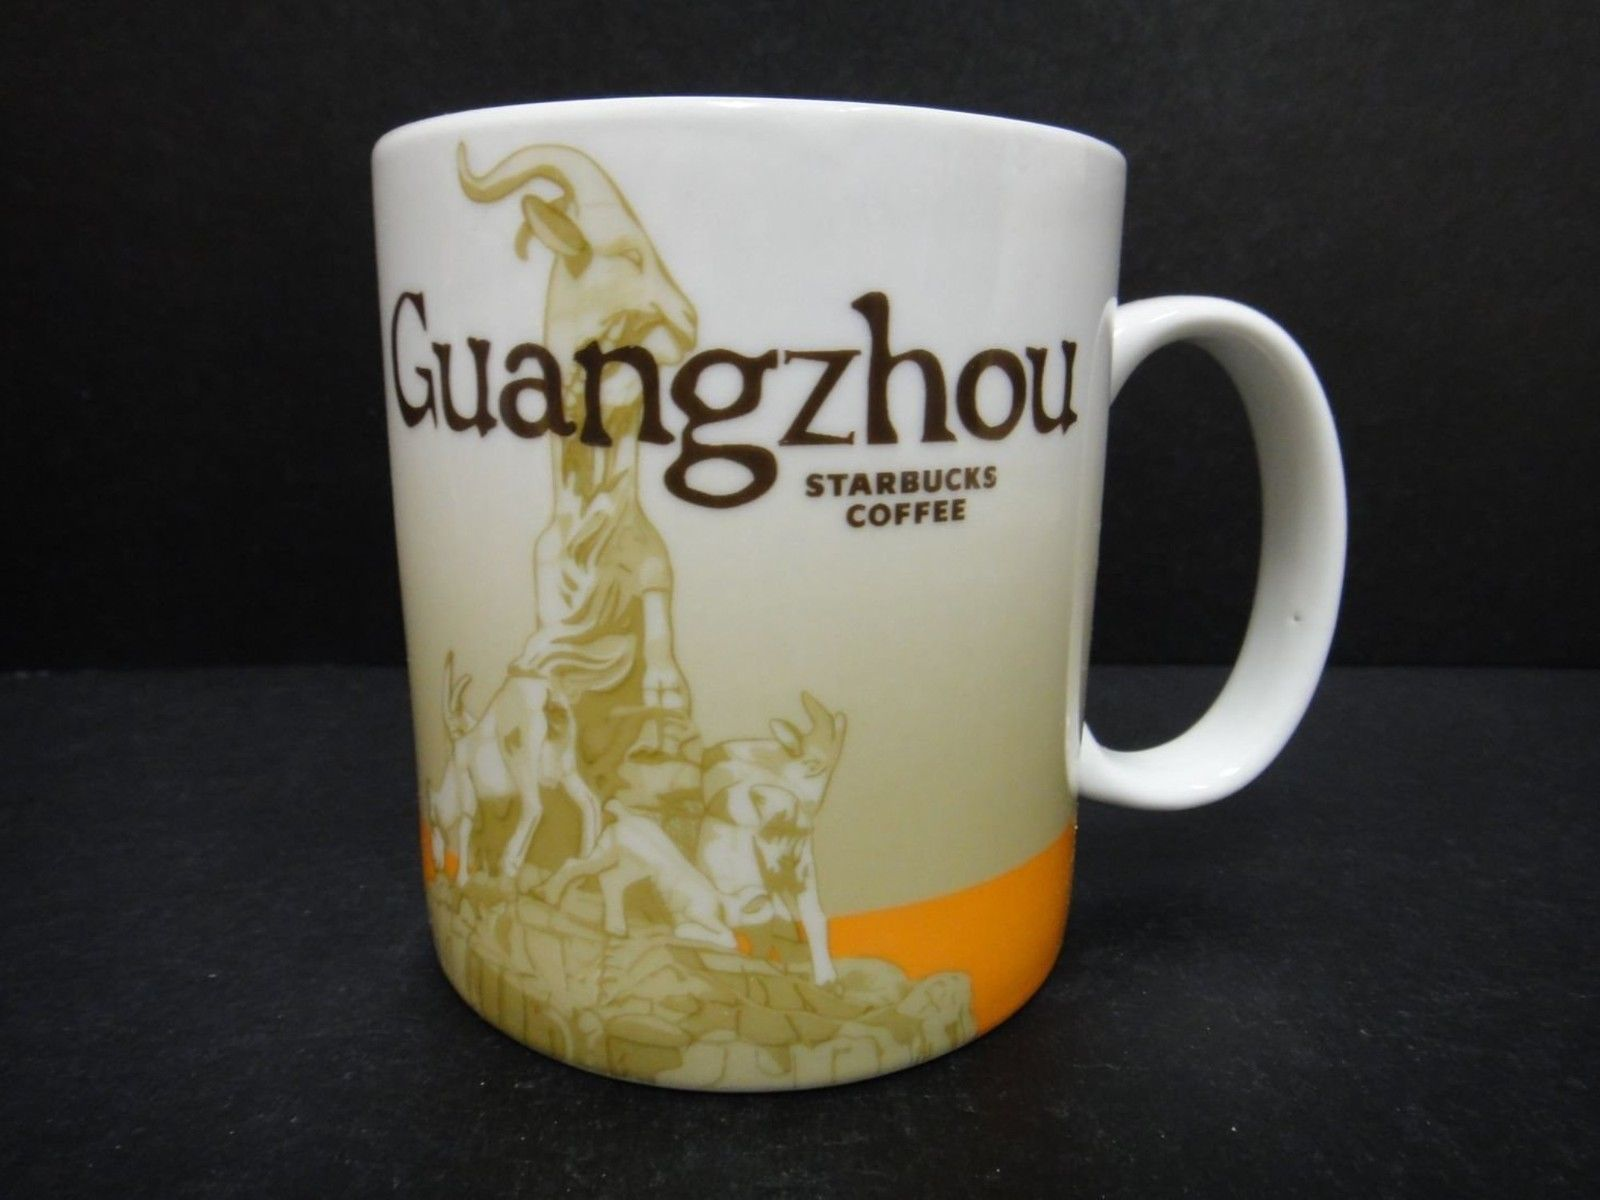 new China Starbucks Limited edition city mugs 16oz of quanzhou